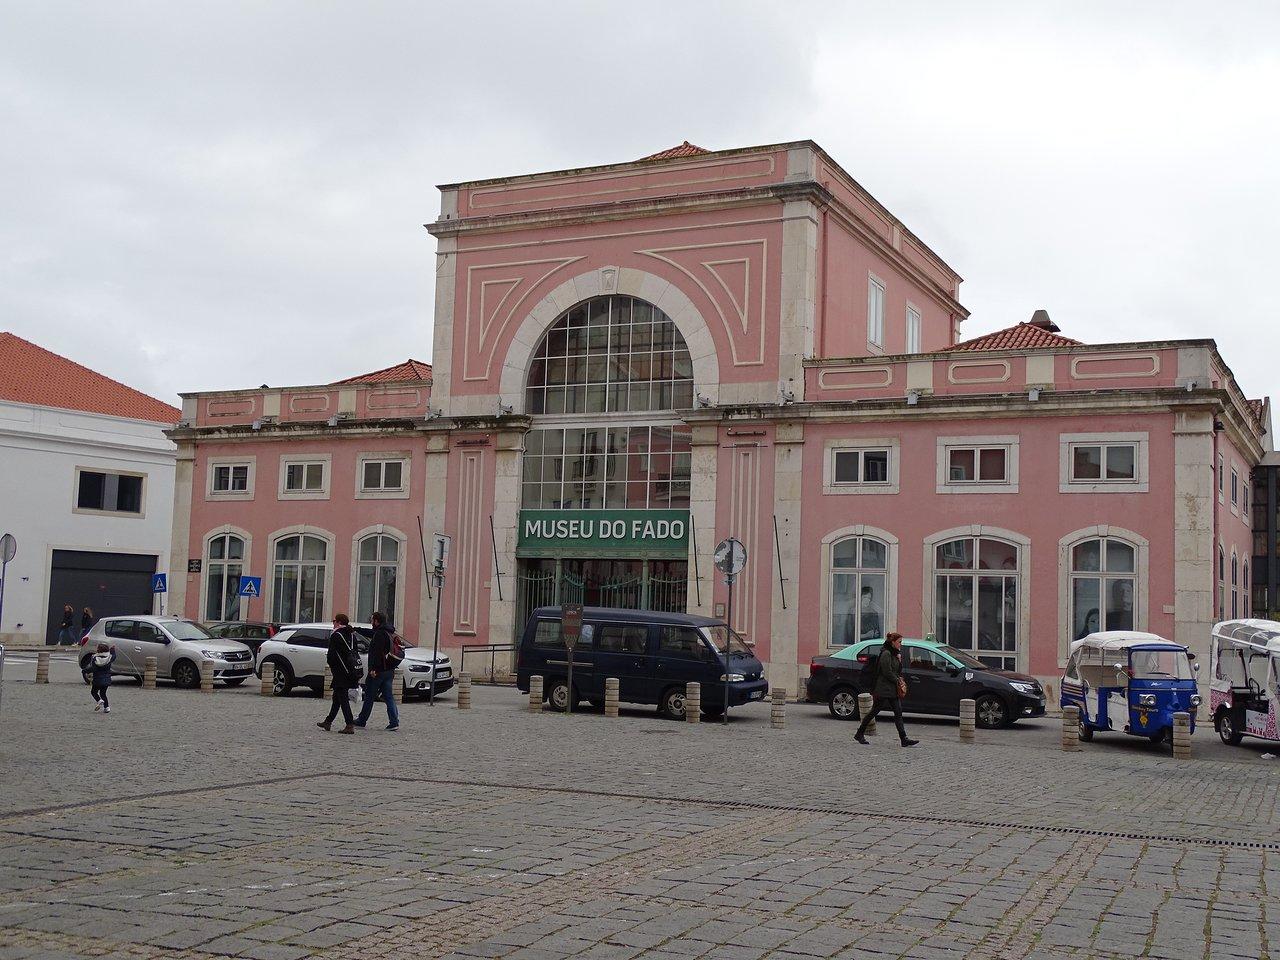 Museu do Fado (Lisbon) - 2020 All You Need to Know Before You Go ...